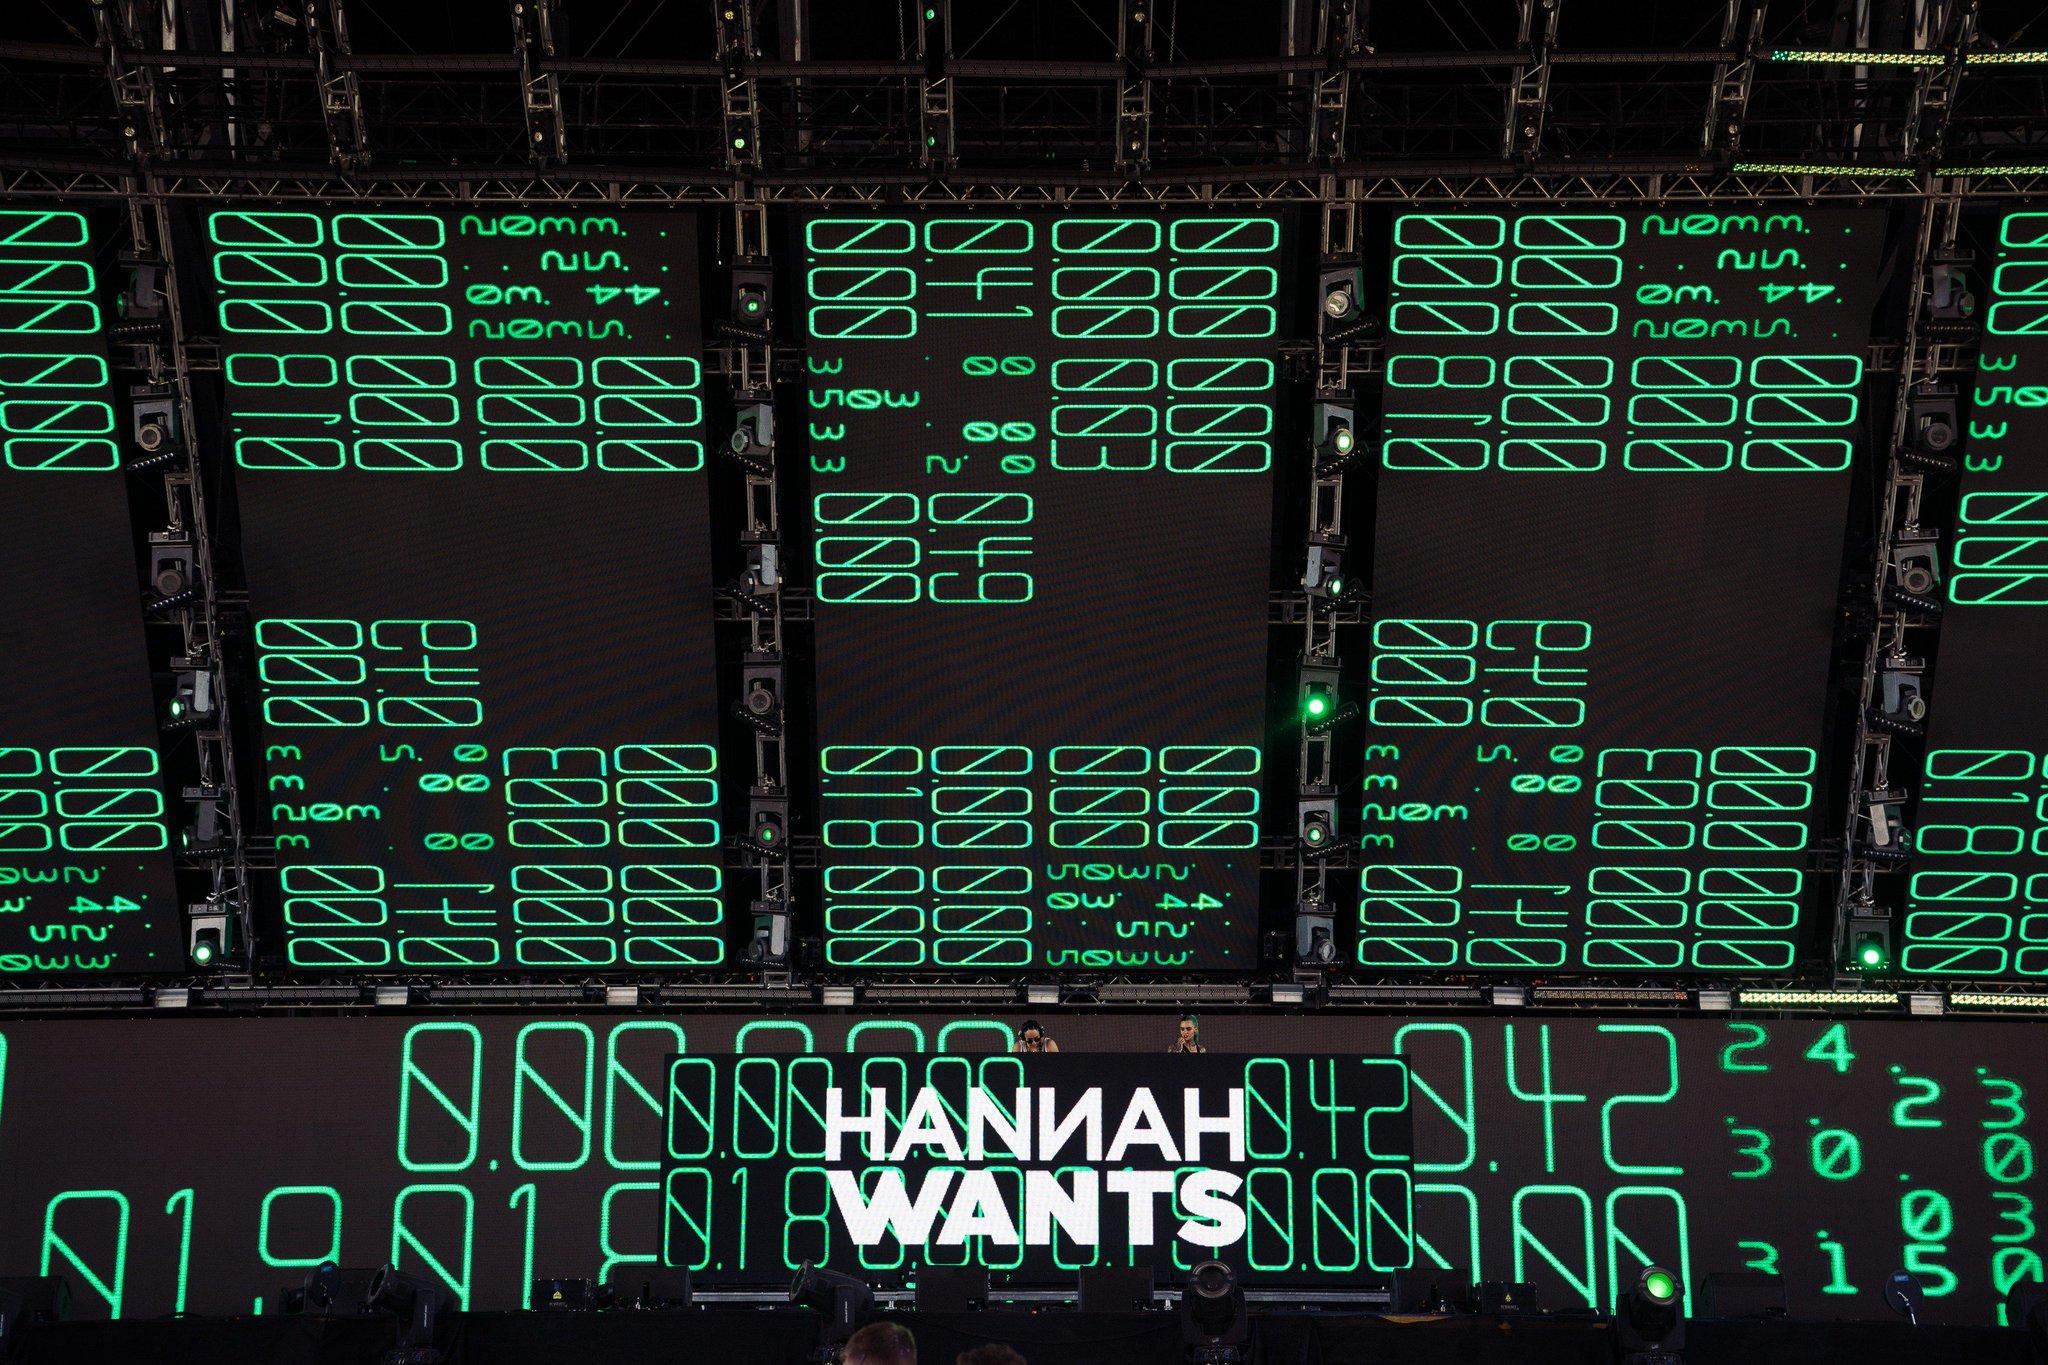 .@hannah_wants brought it �� https://t.co/haTPrceUiy